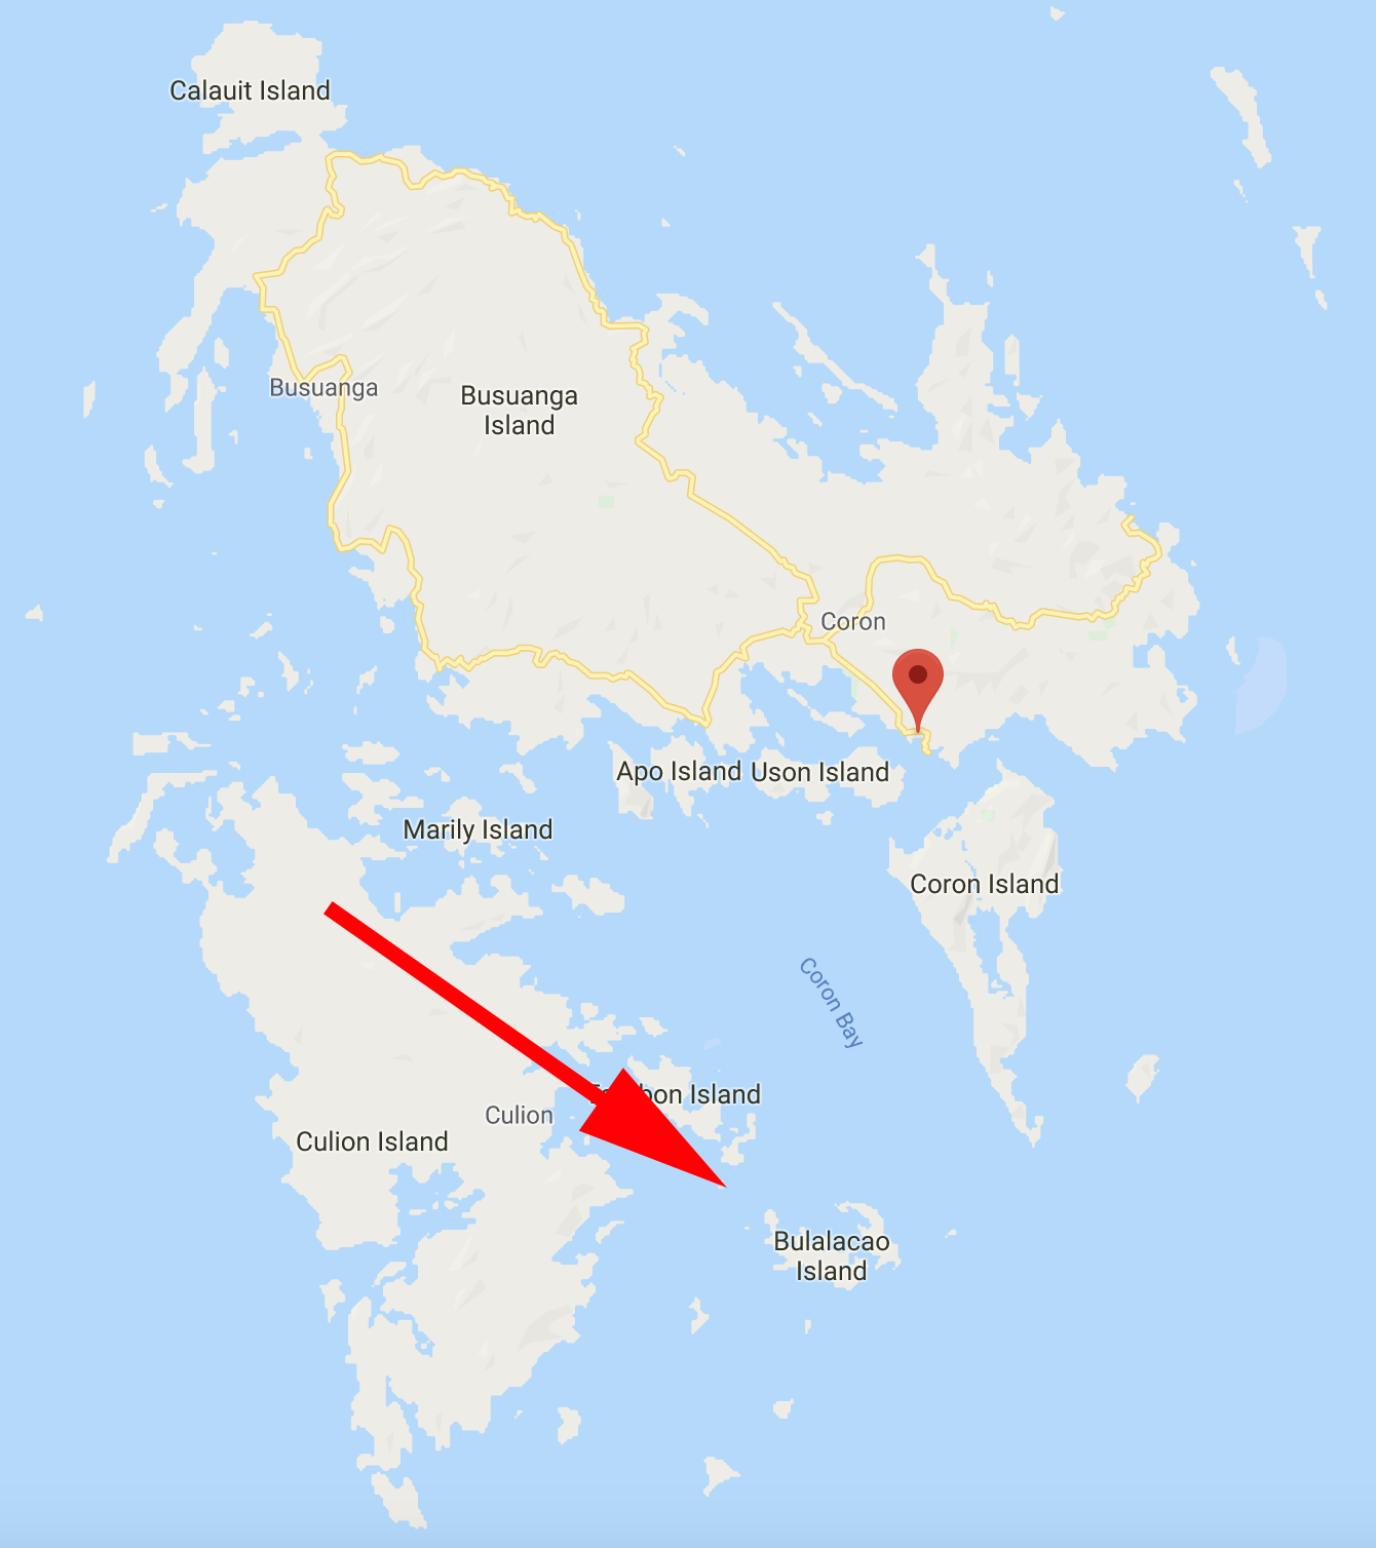 coron island hopping map